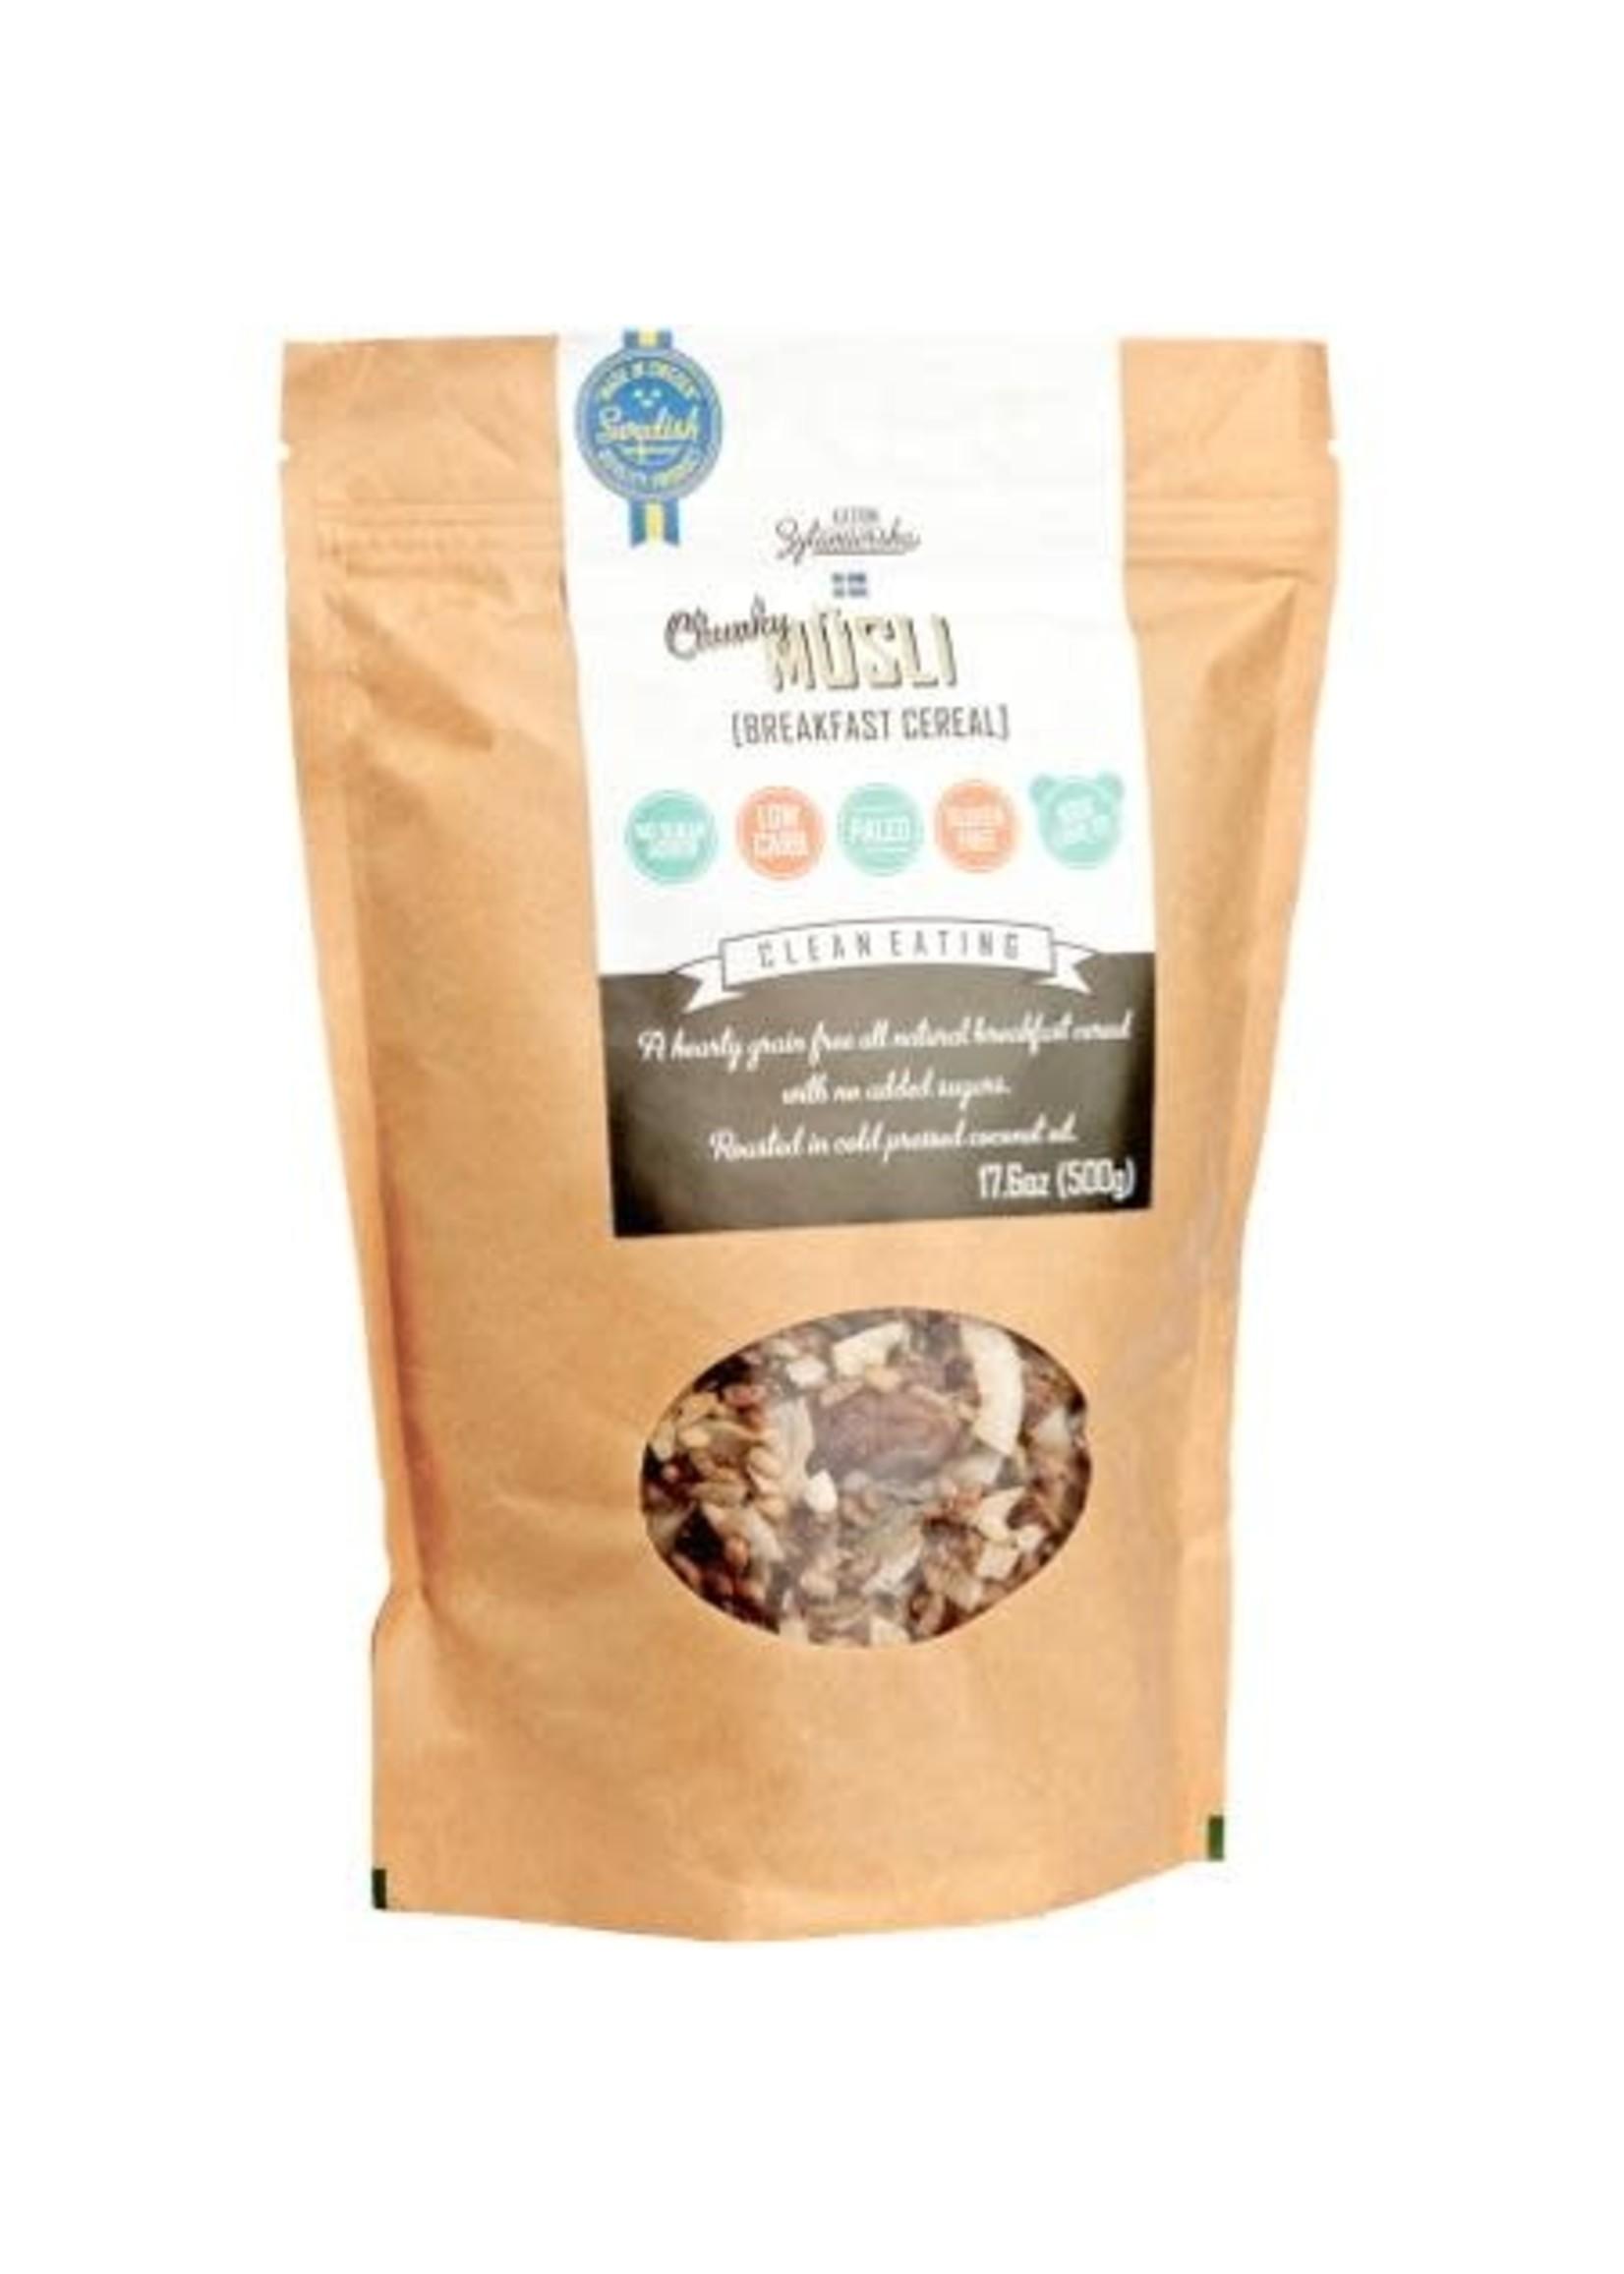 KZ Clean Eating Chunky Musli Chocolate 500g